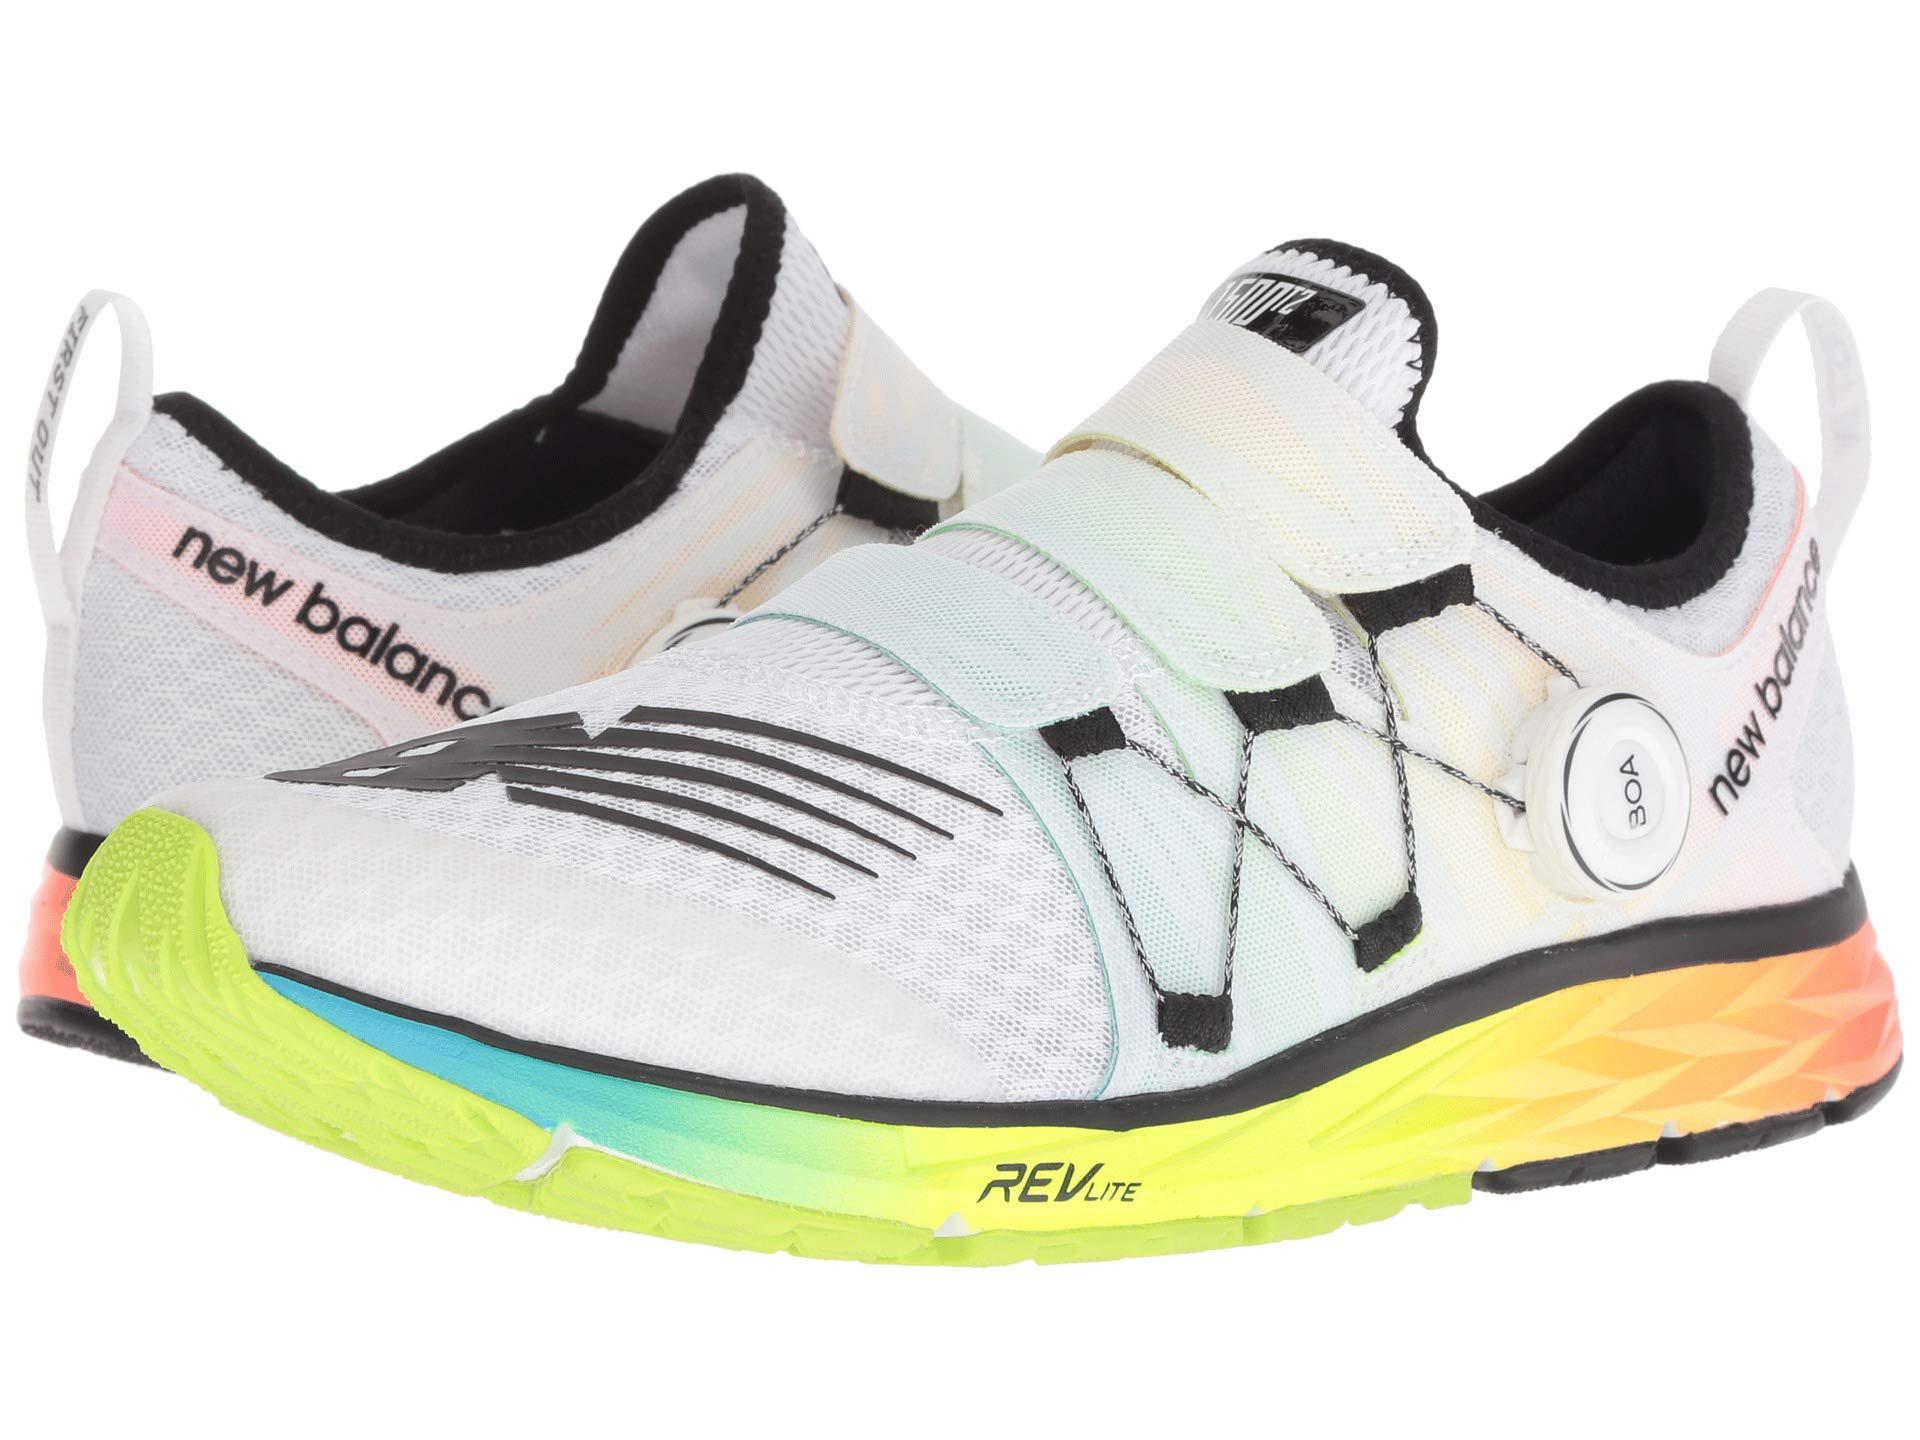 1500t2 (white/multicolor) Men's Running Shoes